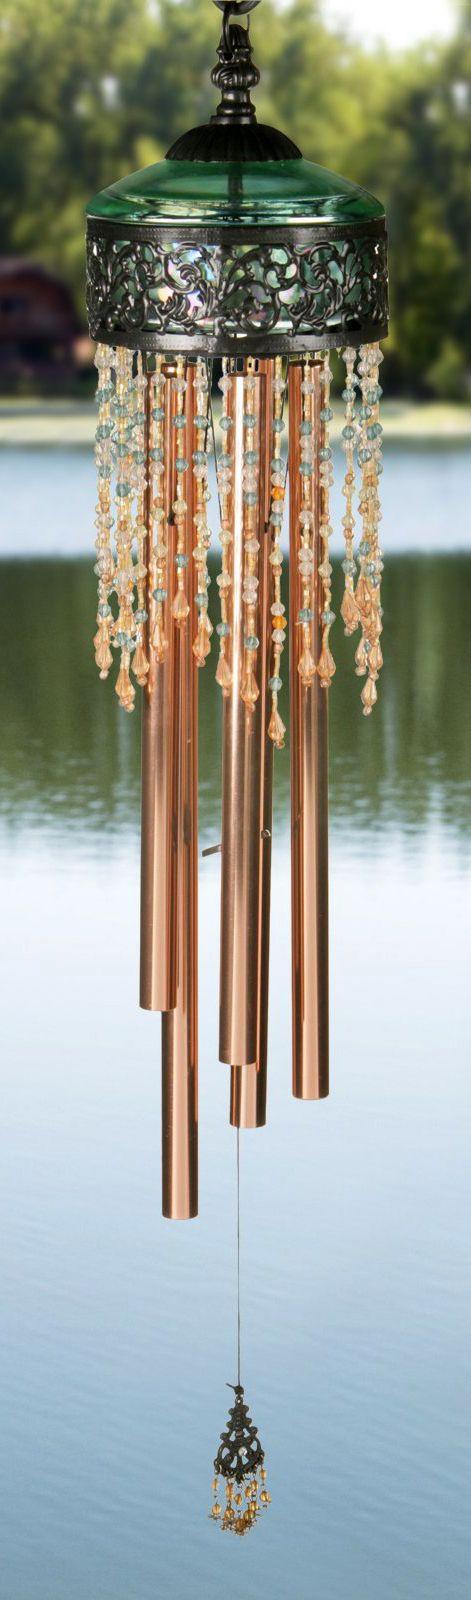 sage beads victorian wind chime windchimes llamador de